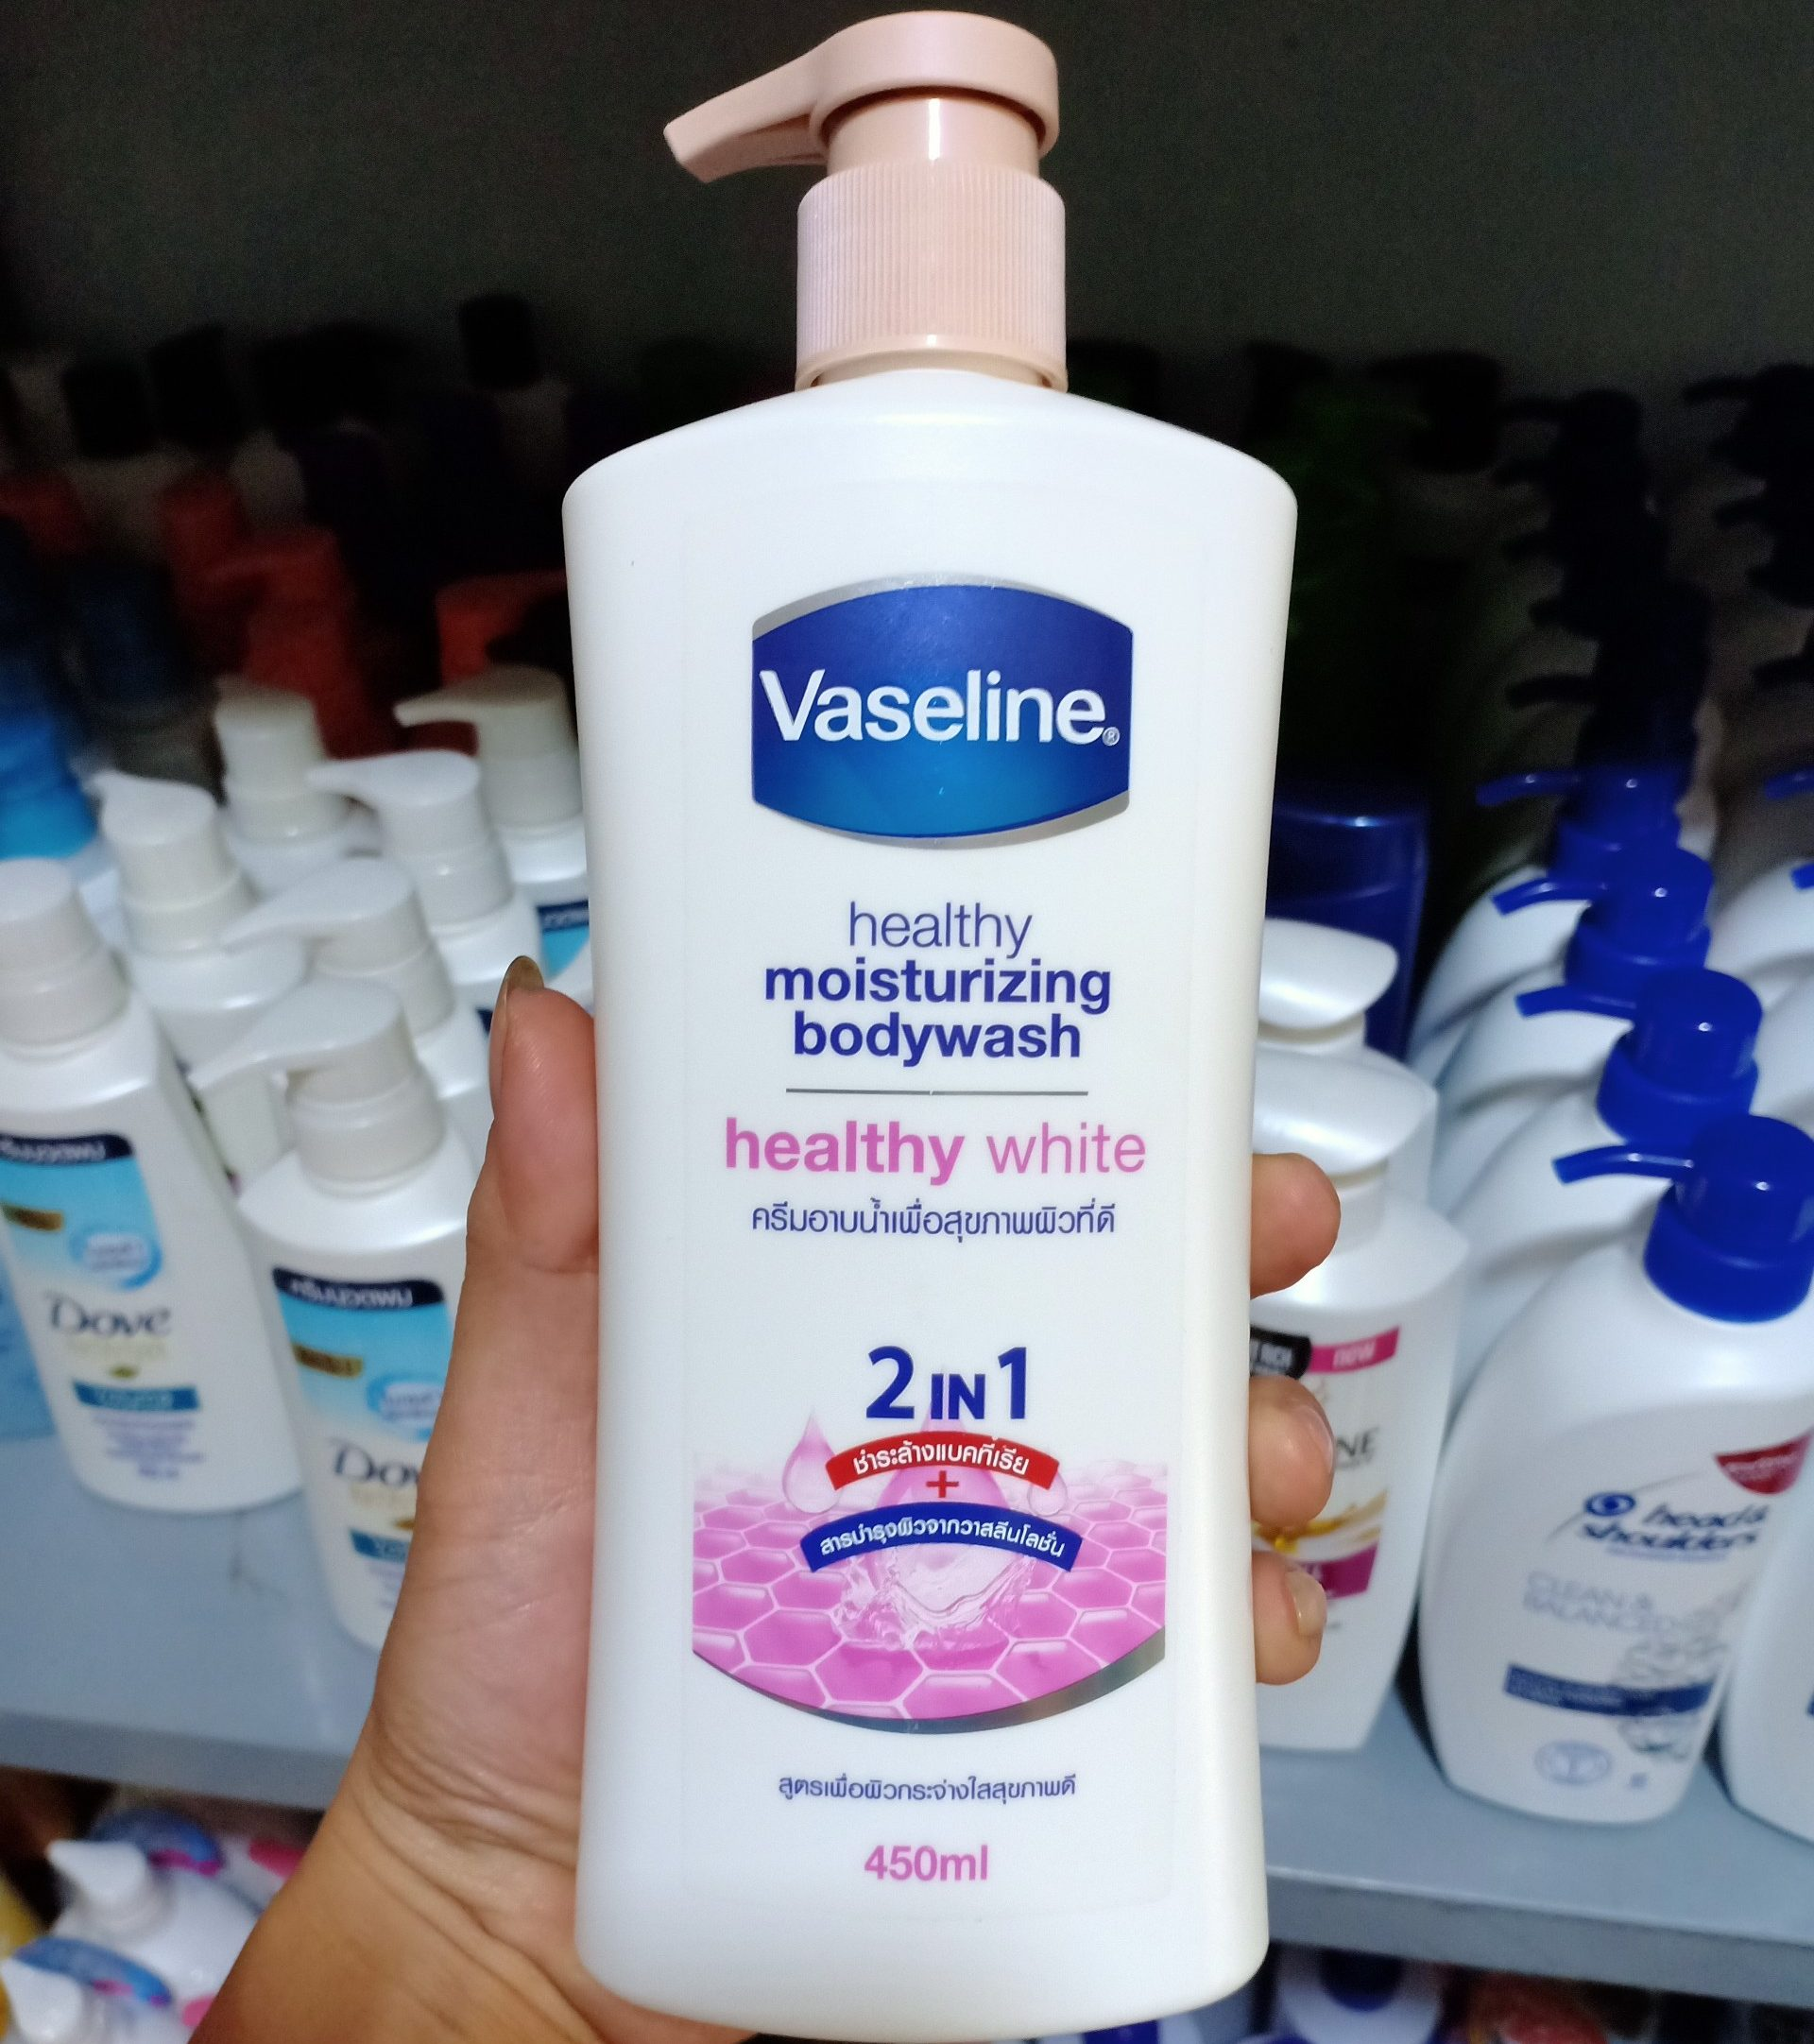 Sữa tắm dưỡng ẩm Vaseline 2 in 1 Healthy Moisturizing Body Wash Healthy White